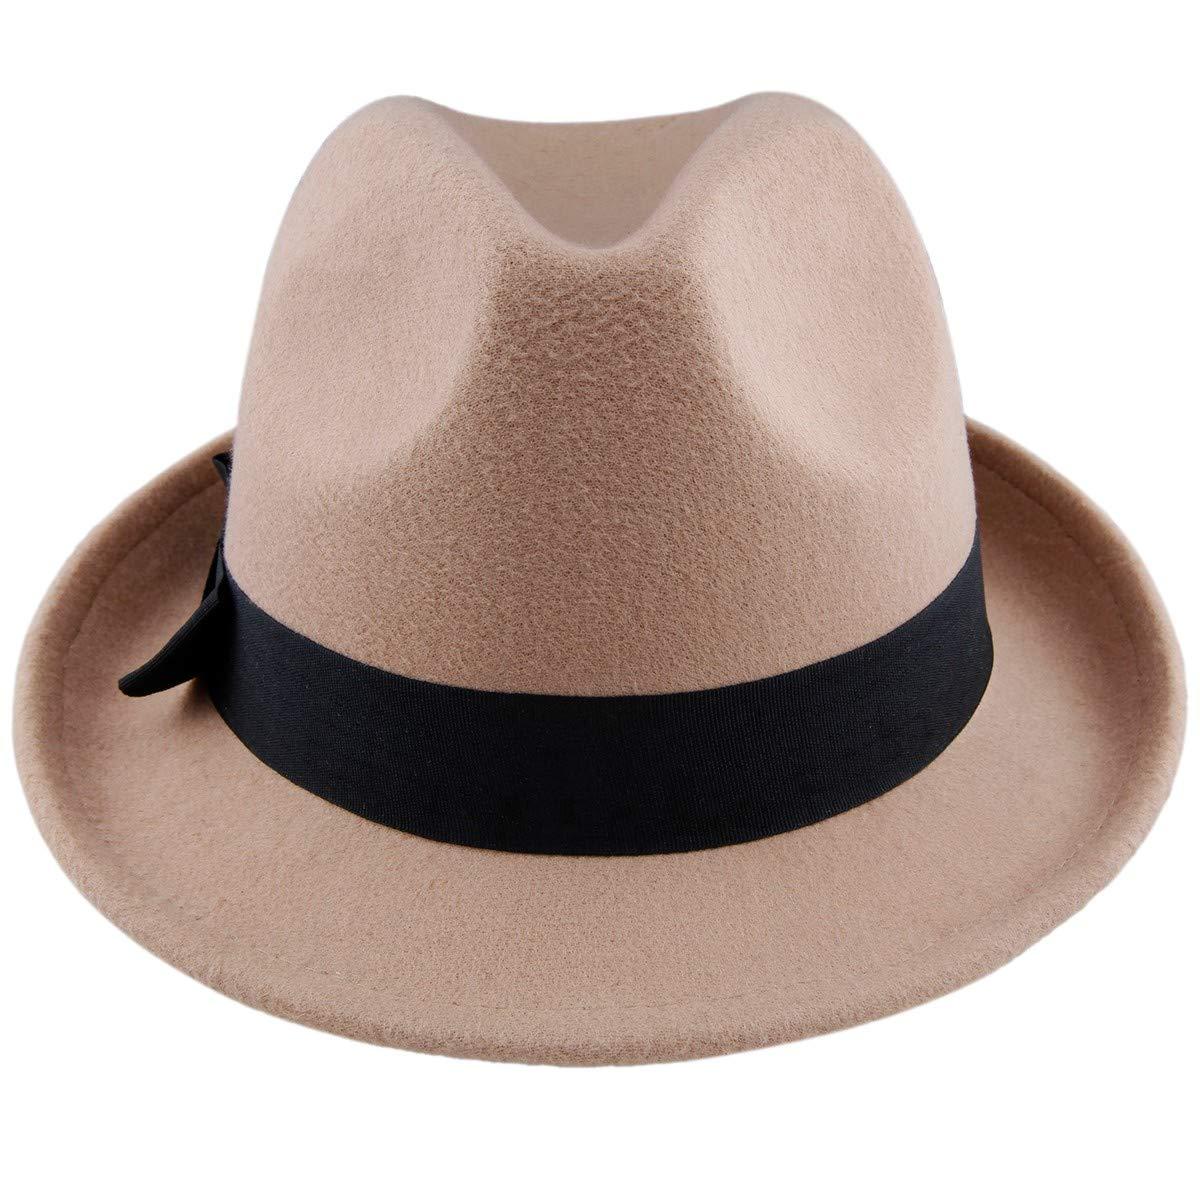 442ca387009f67 Samtree Fedora Hats for Women,Winter Roll-up Brim Trilby Woolen Jazz Cap  AM0506-1